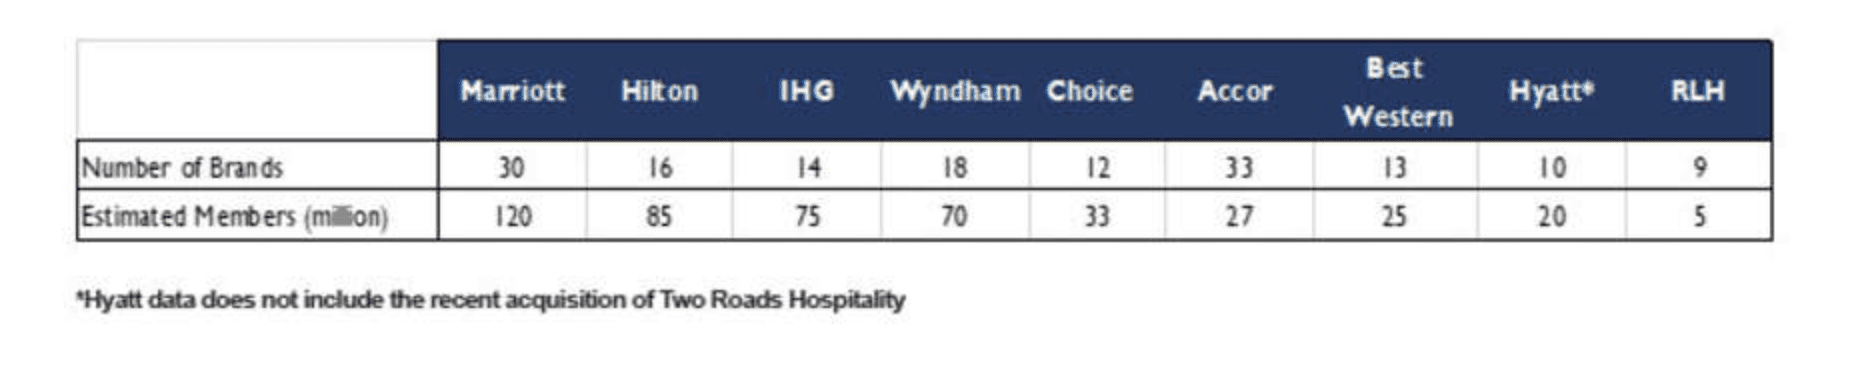 Customer Loyalty chart